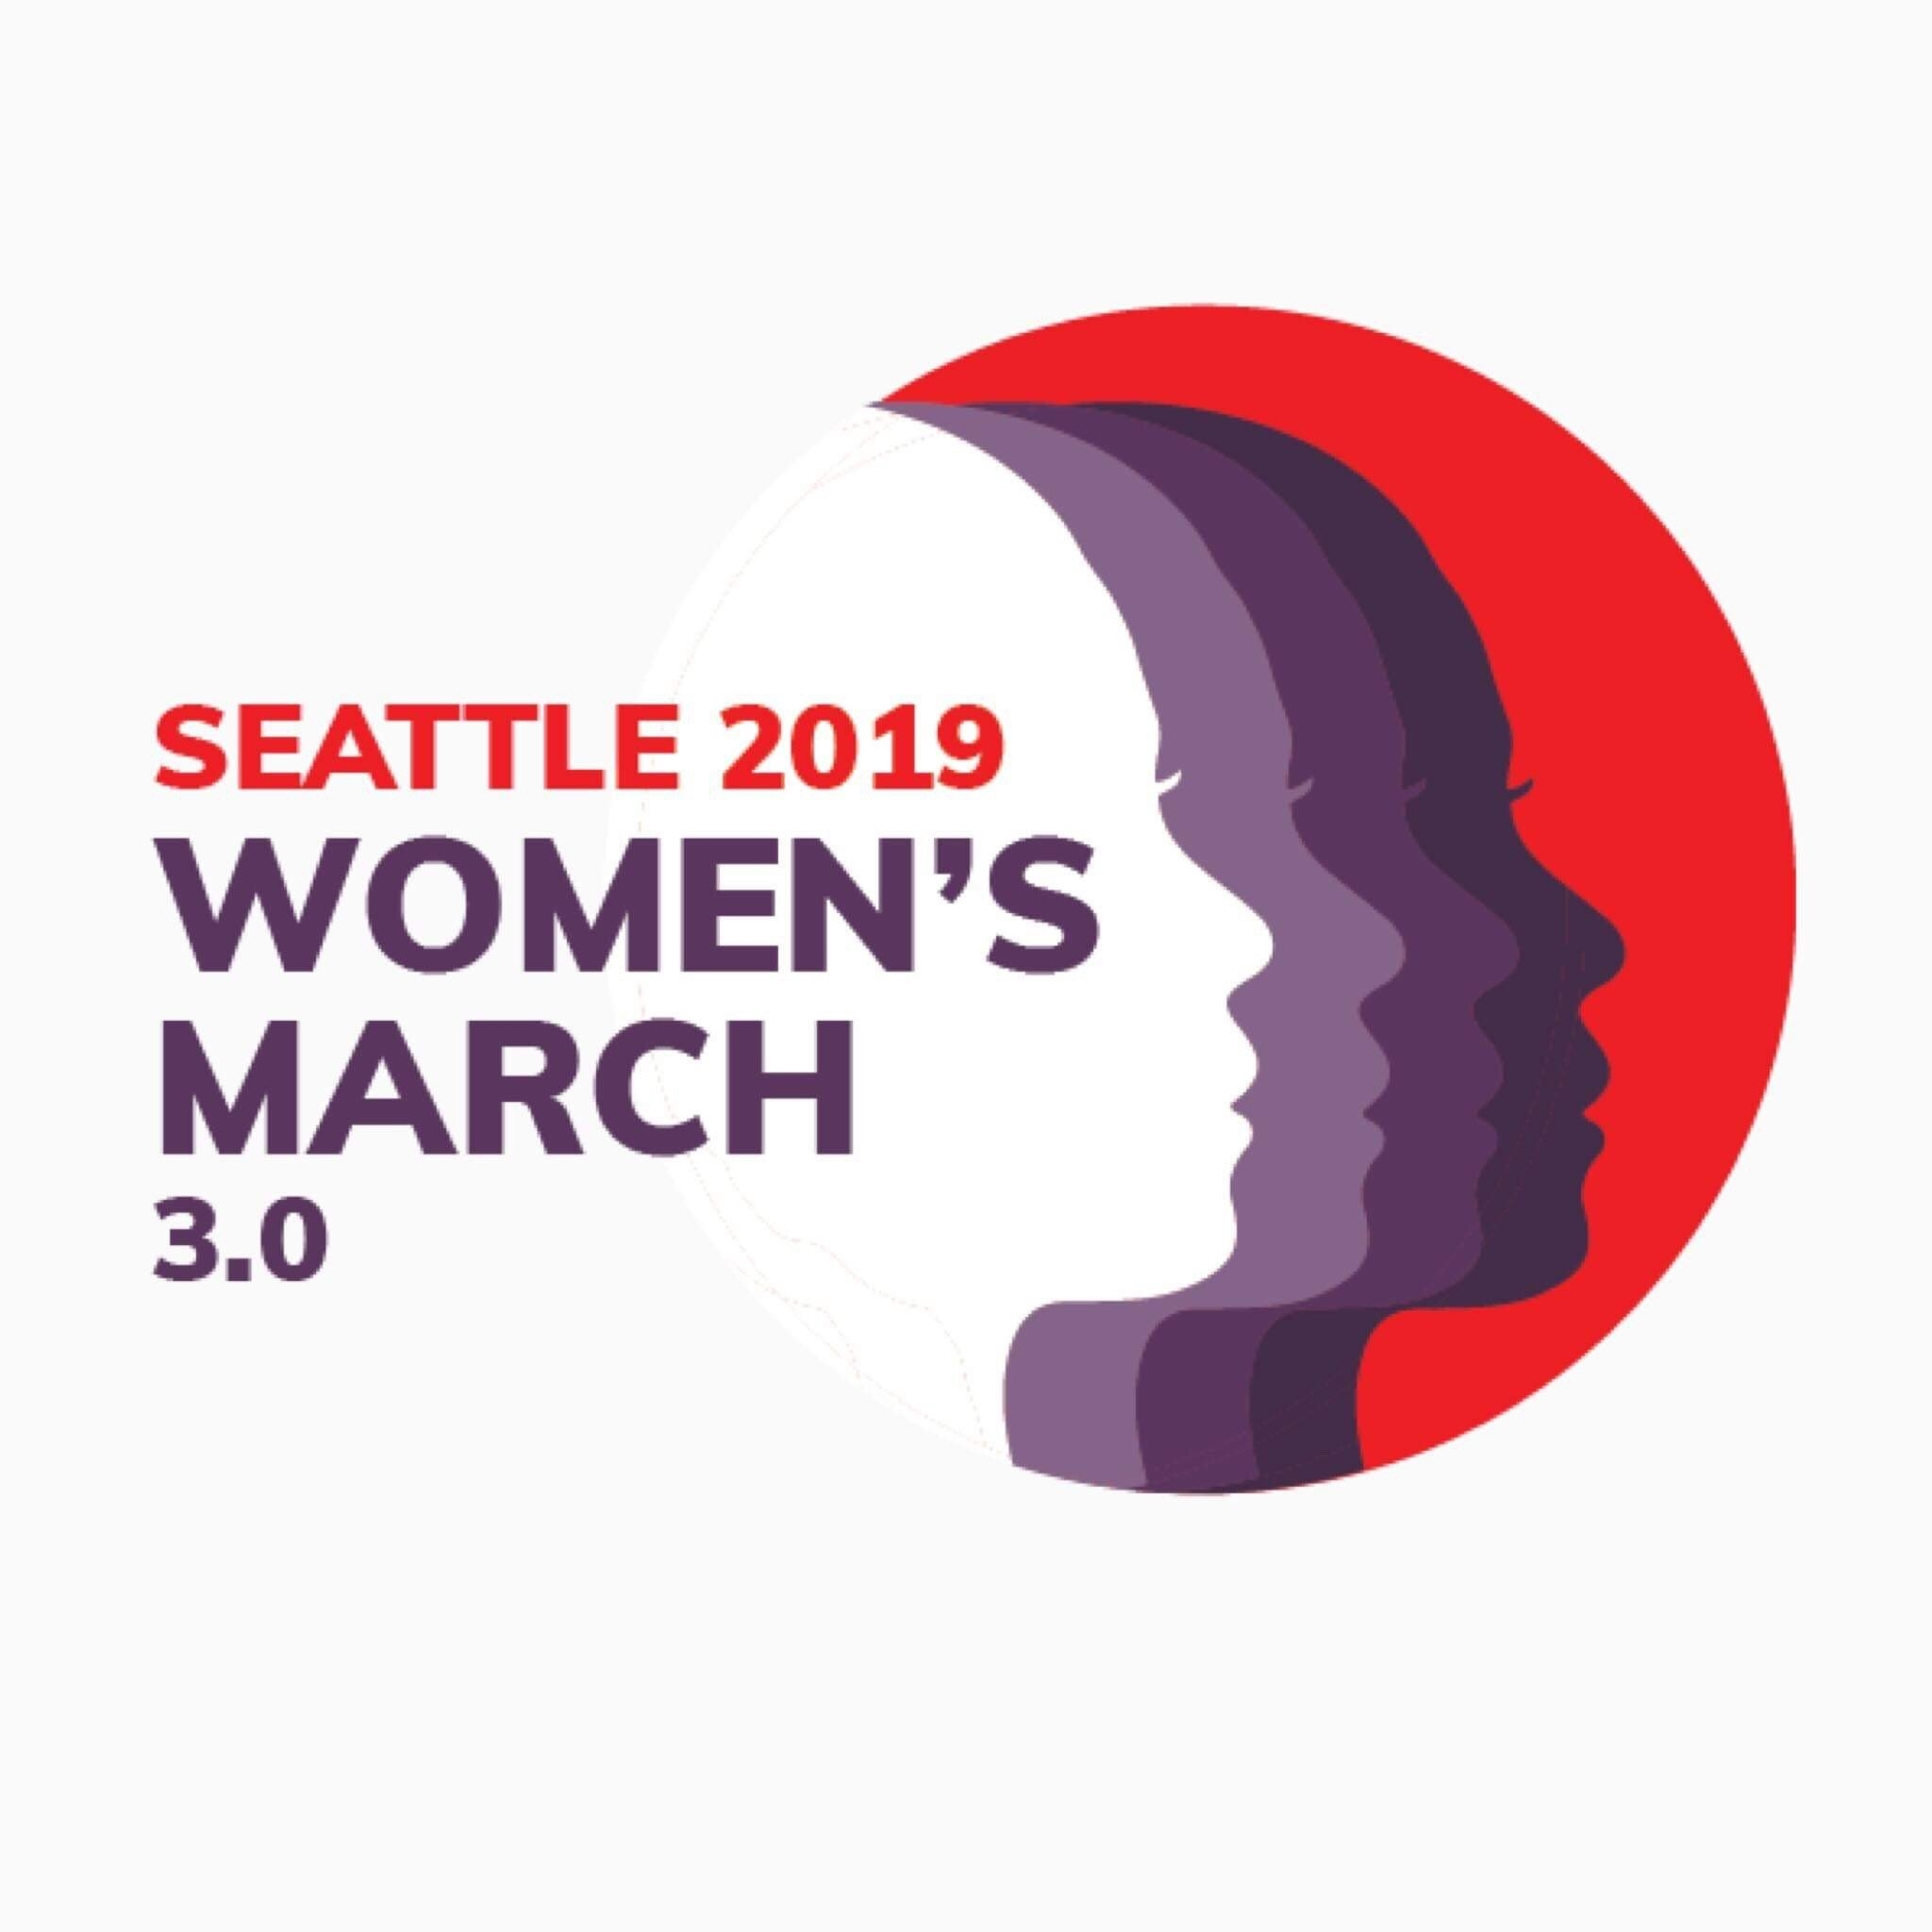 2019 Seattle Women's March 3.0 At Occidental Square In Seattle, Wa Seattle U Calendar 2019